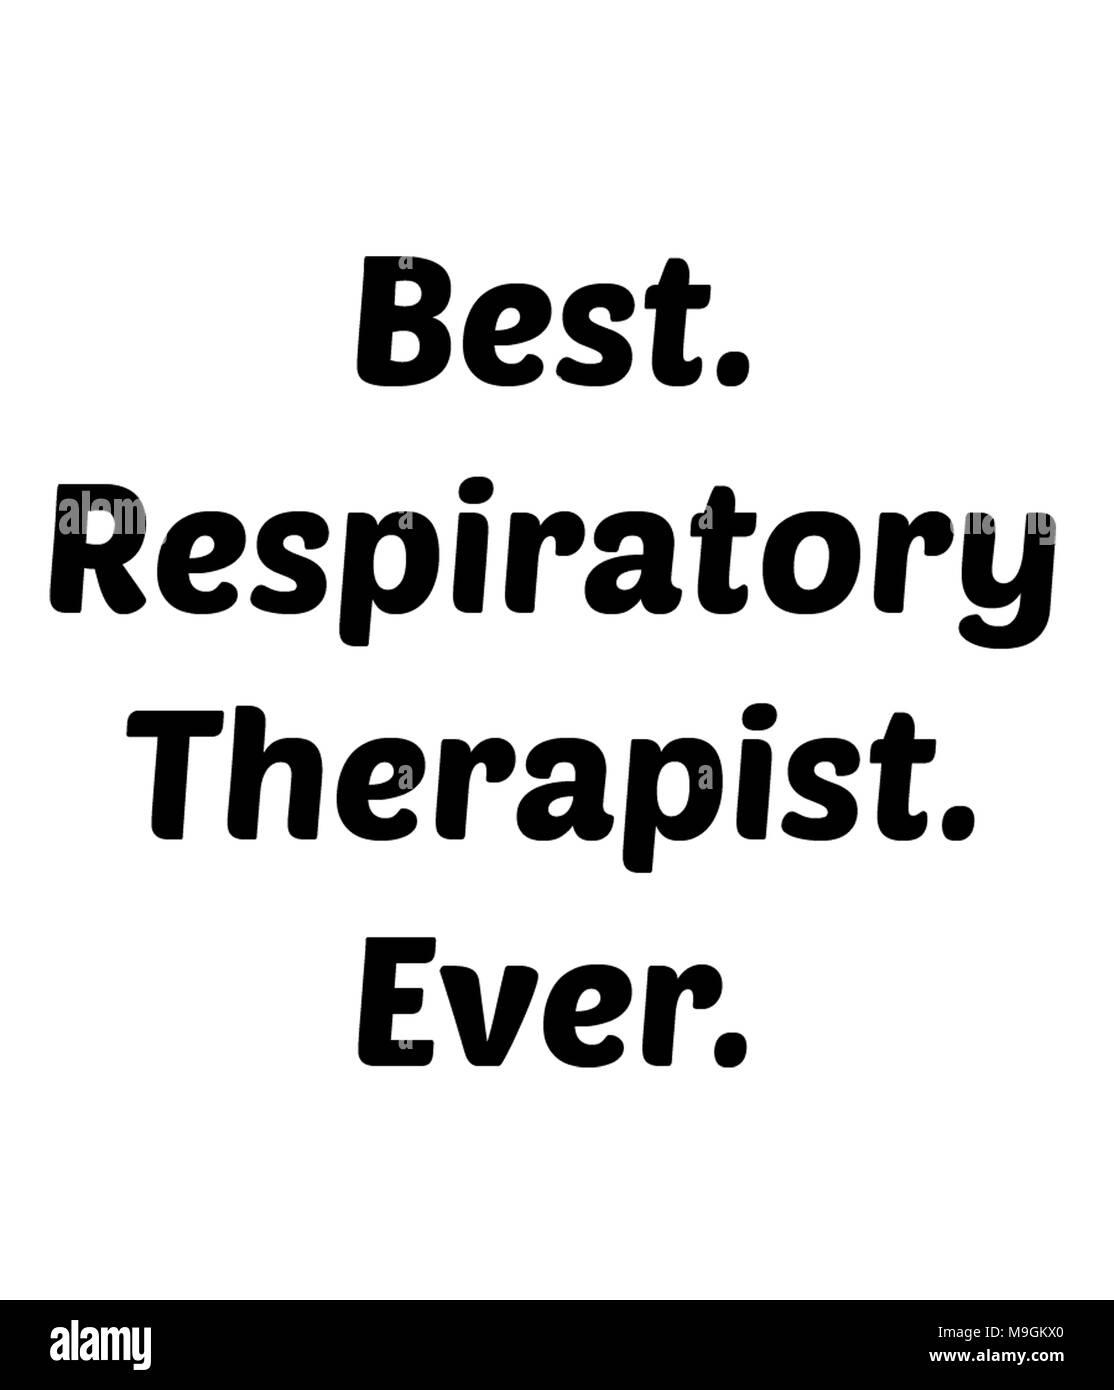 Best. Respiratory Therapist. Ever. - Stock Image